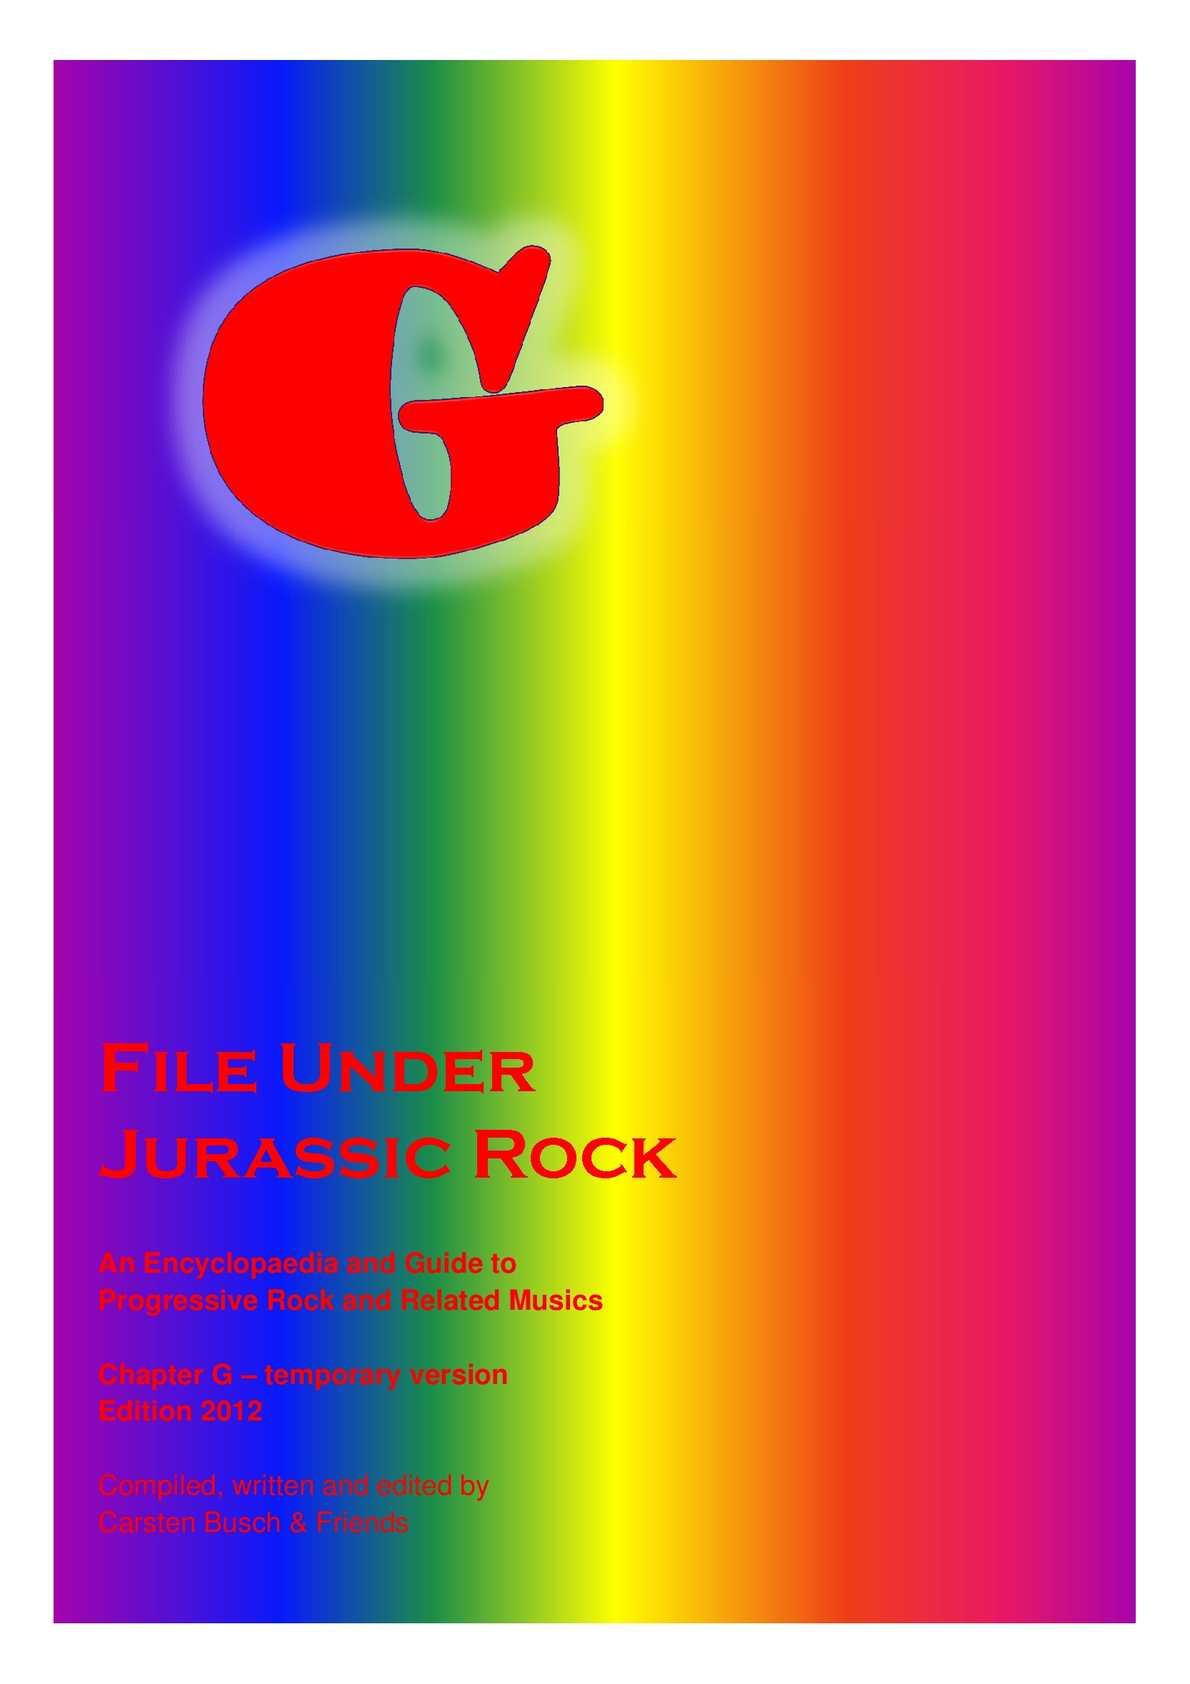 09afb981c1 Calaméo - File Under Jurassic Rock - G temporary (2012)